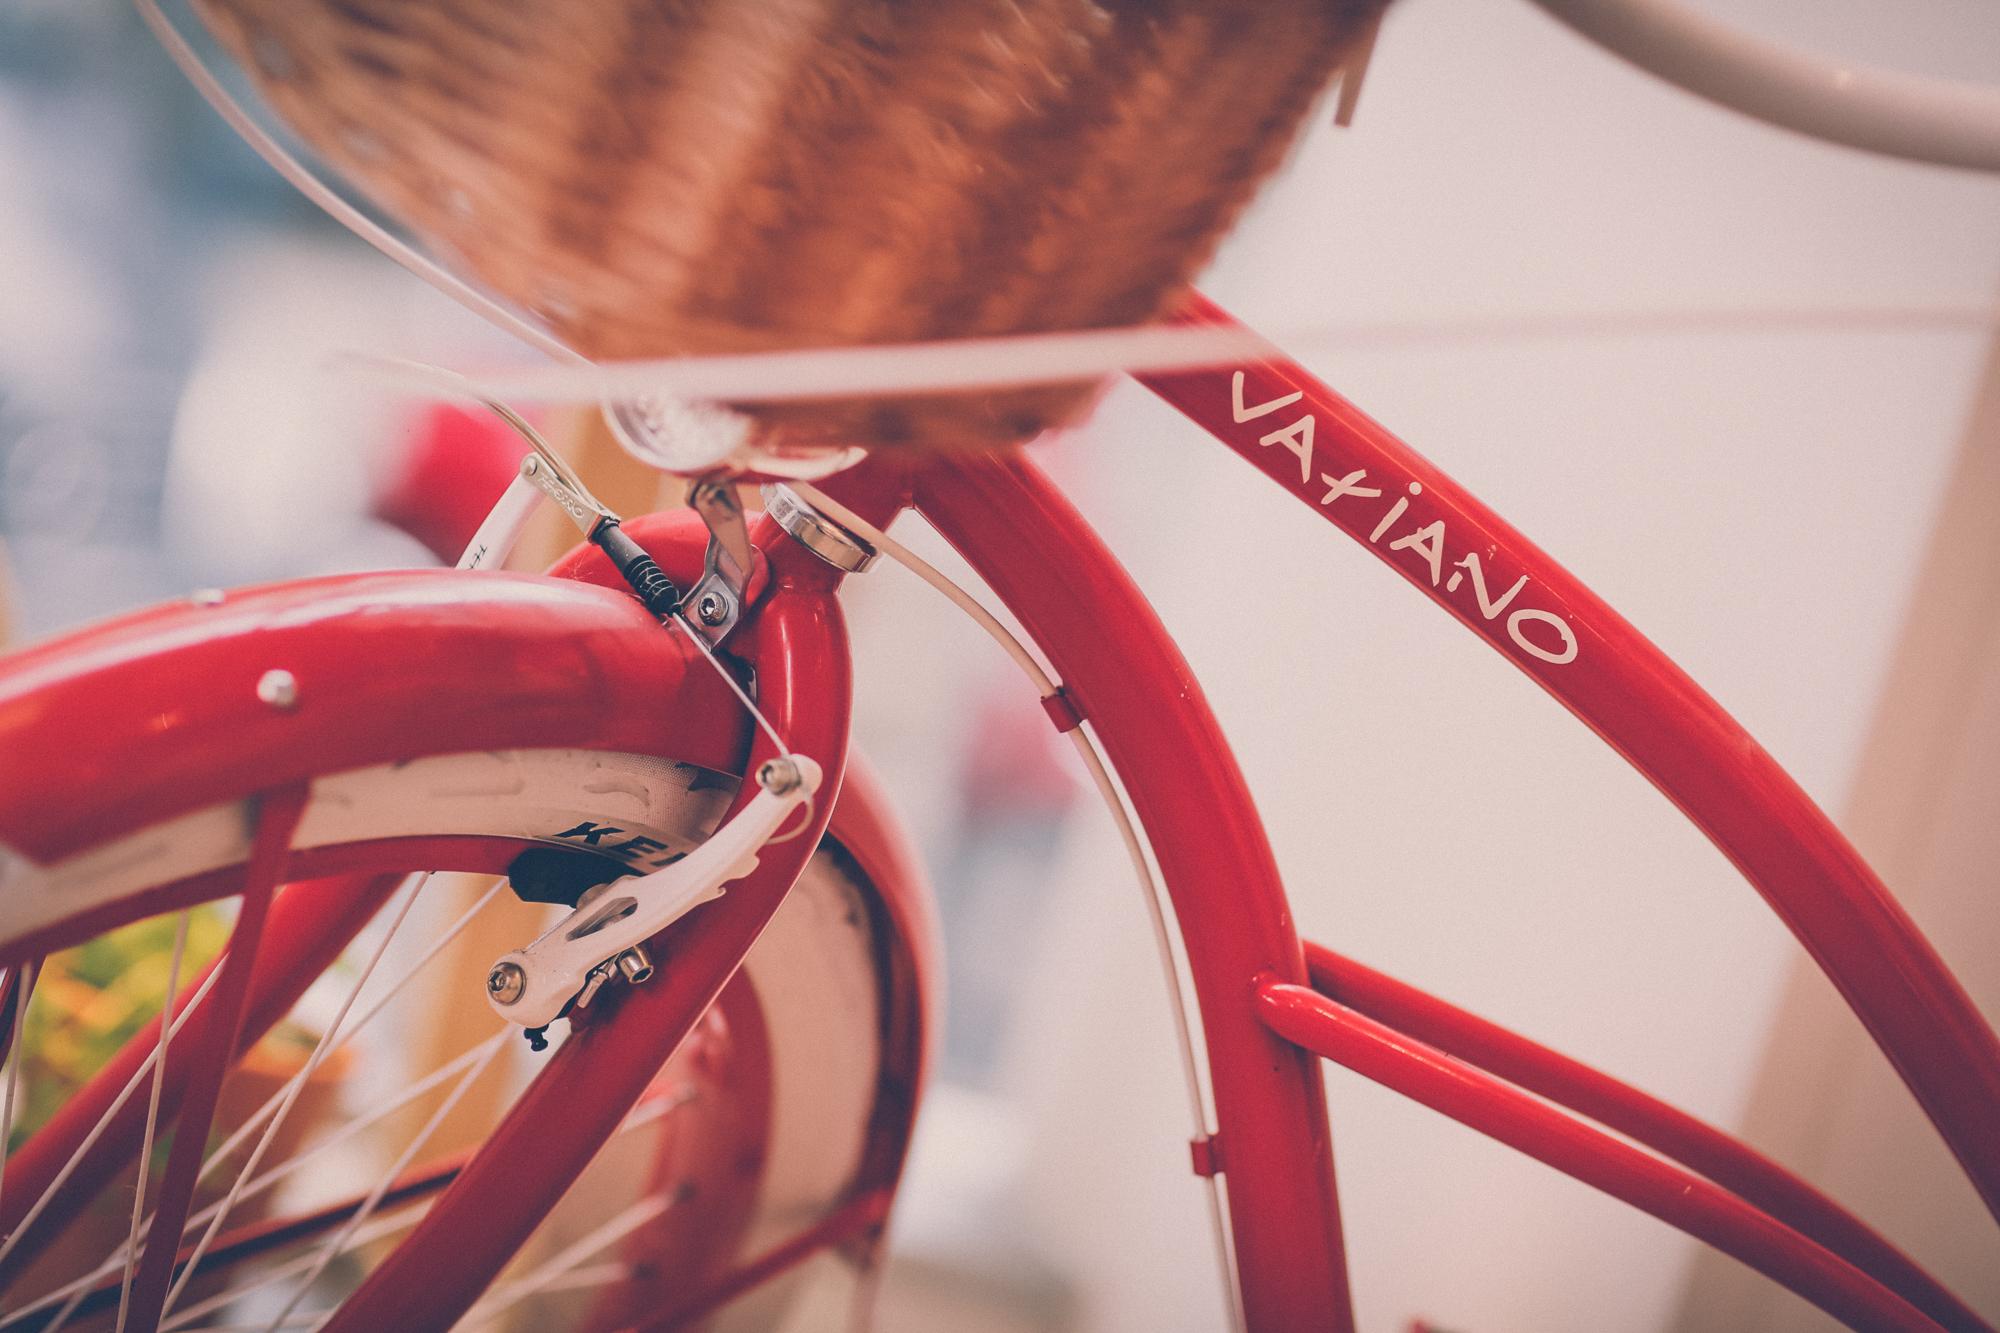 Vapianos33